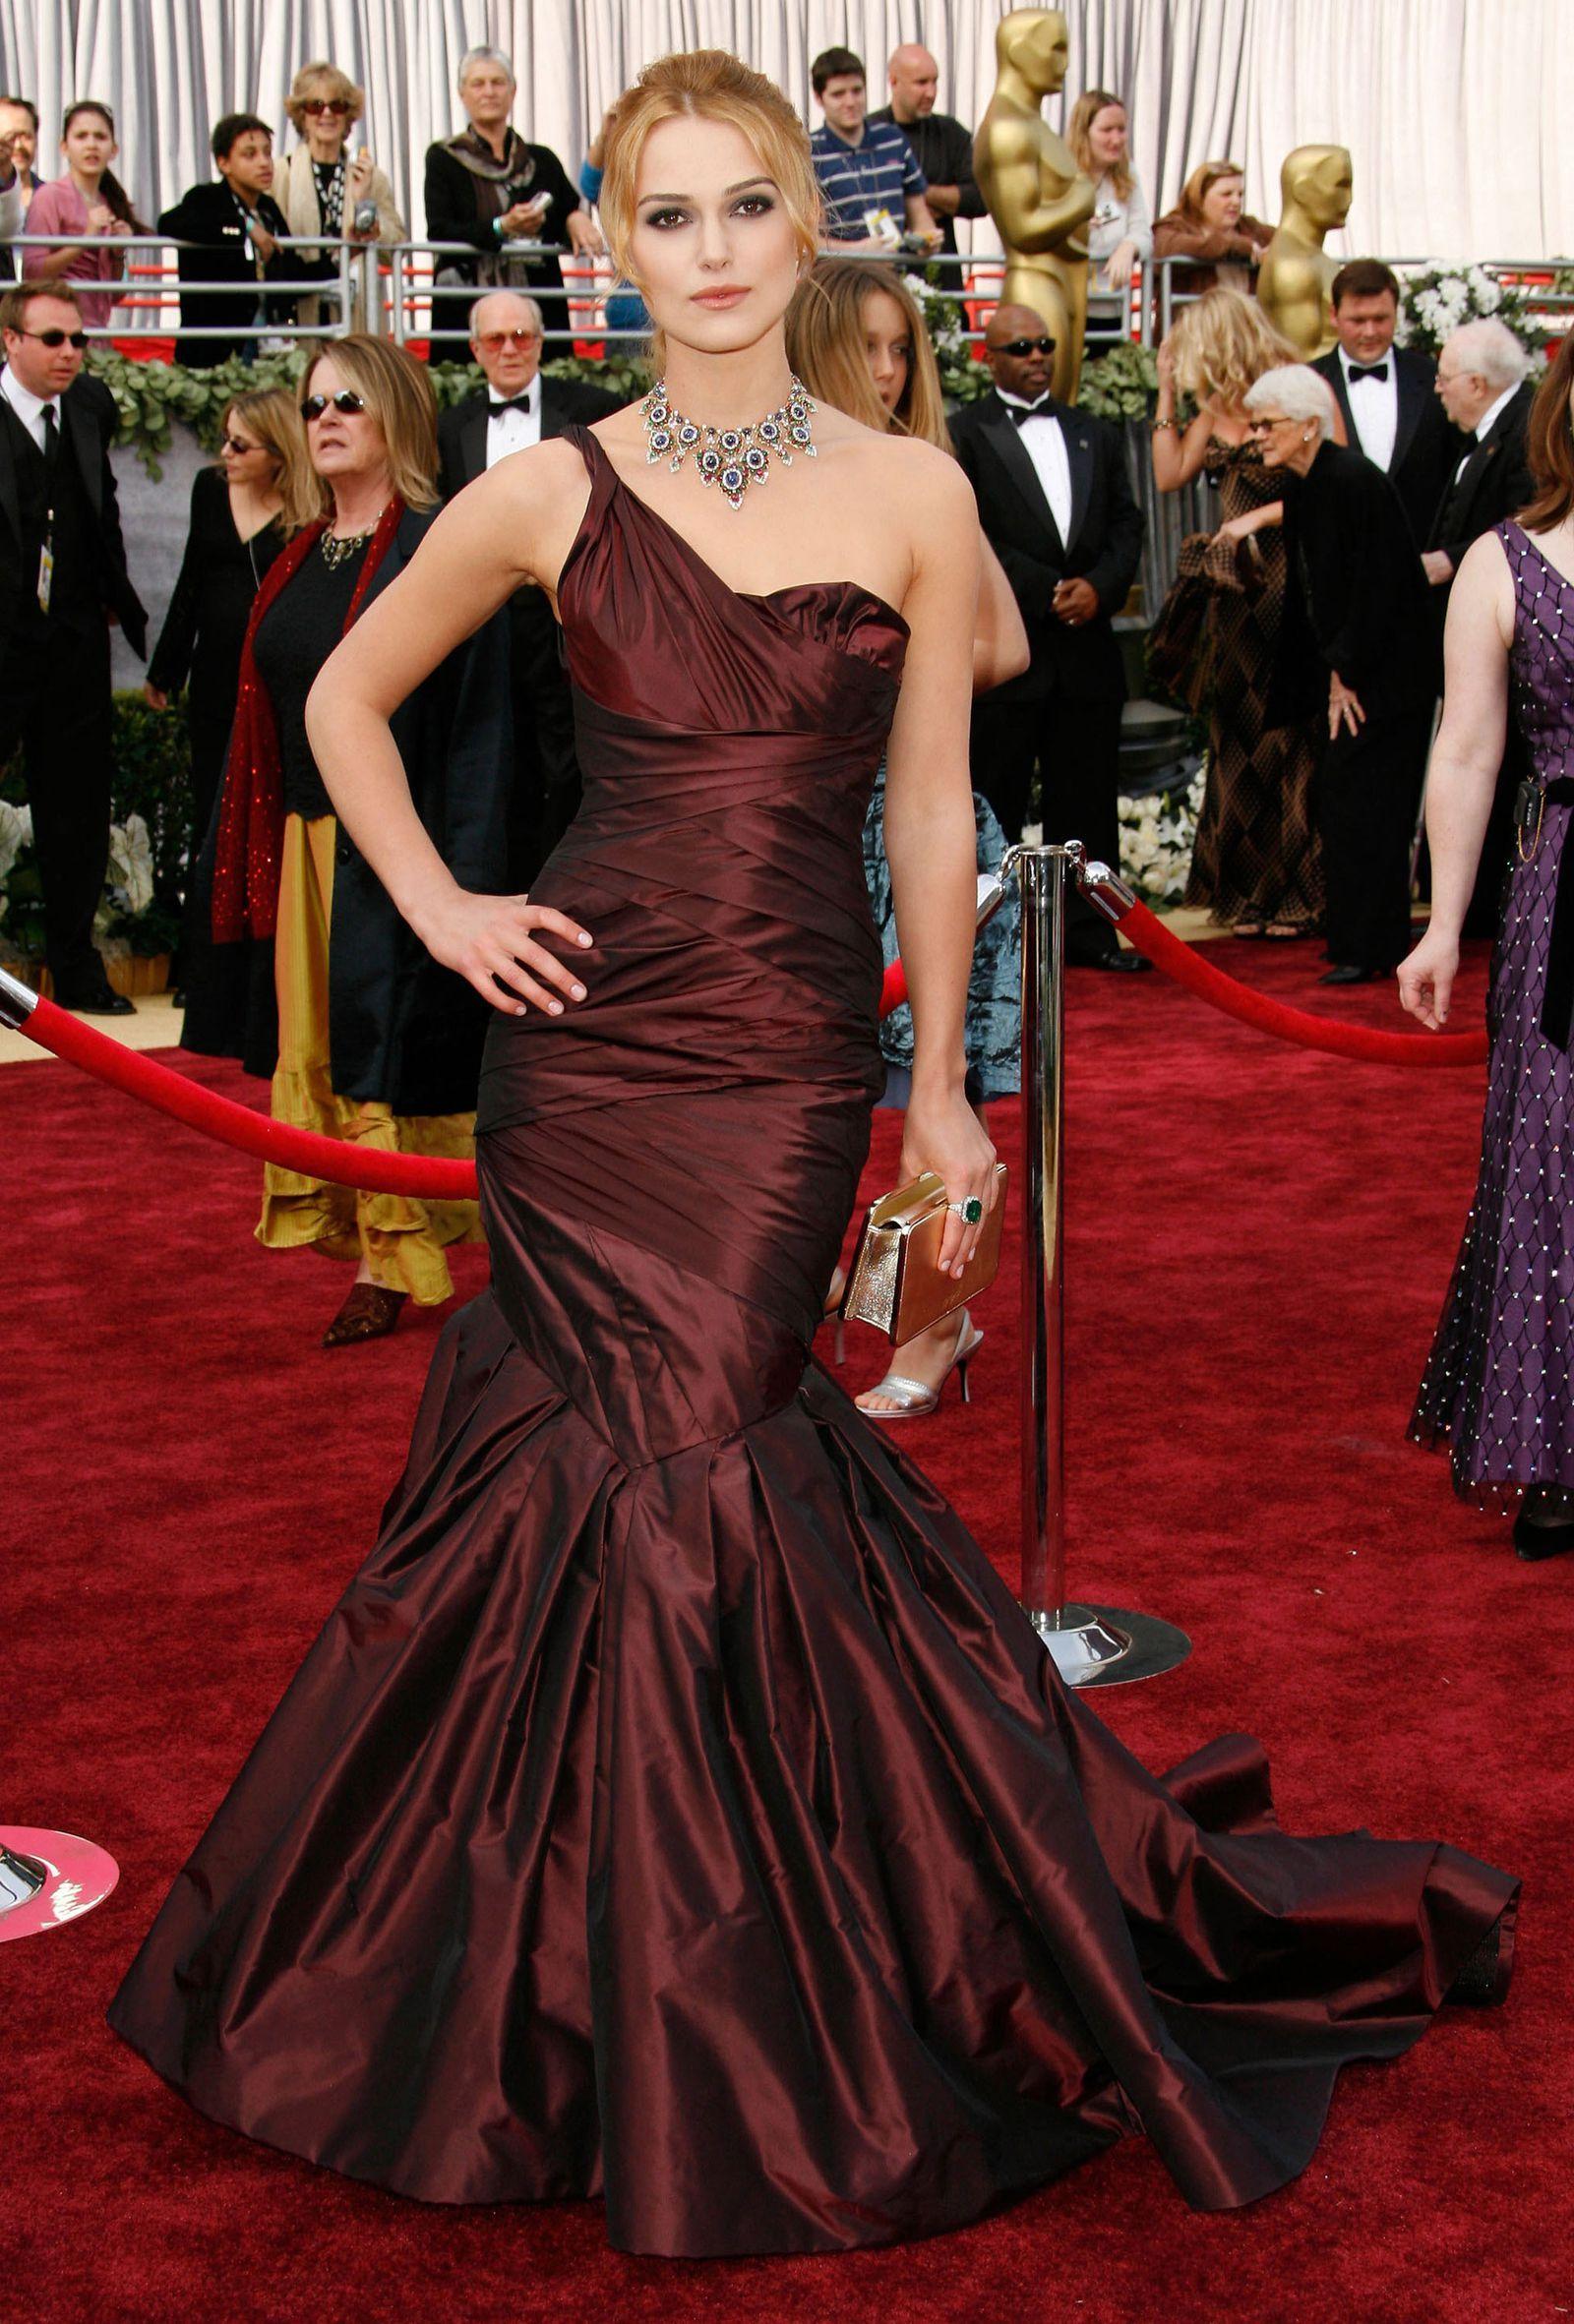 065e6b289c20 #KeiraKnightley, 2006 #VeraWang #gowns #AcademyAwards #Oscars #fashion  Oscars Red